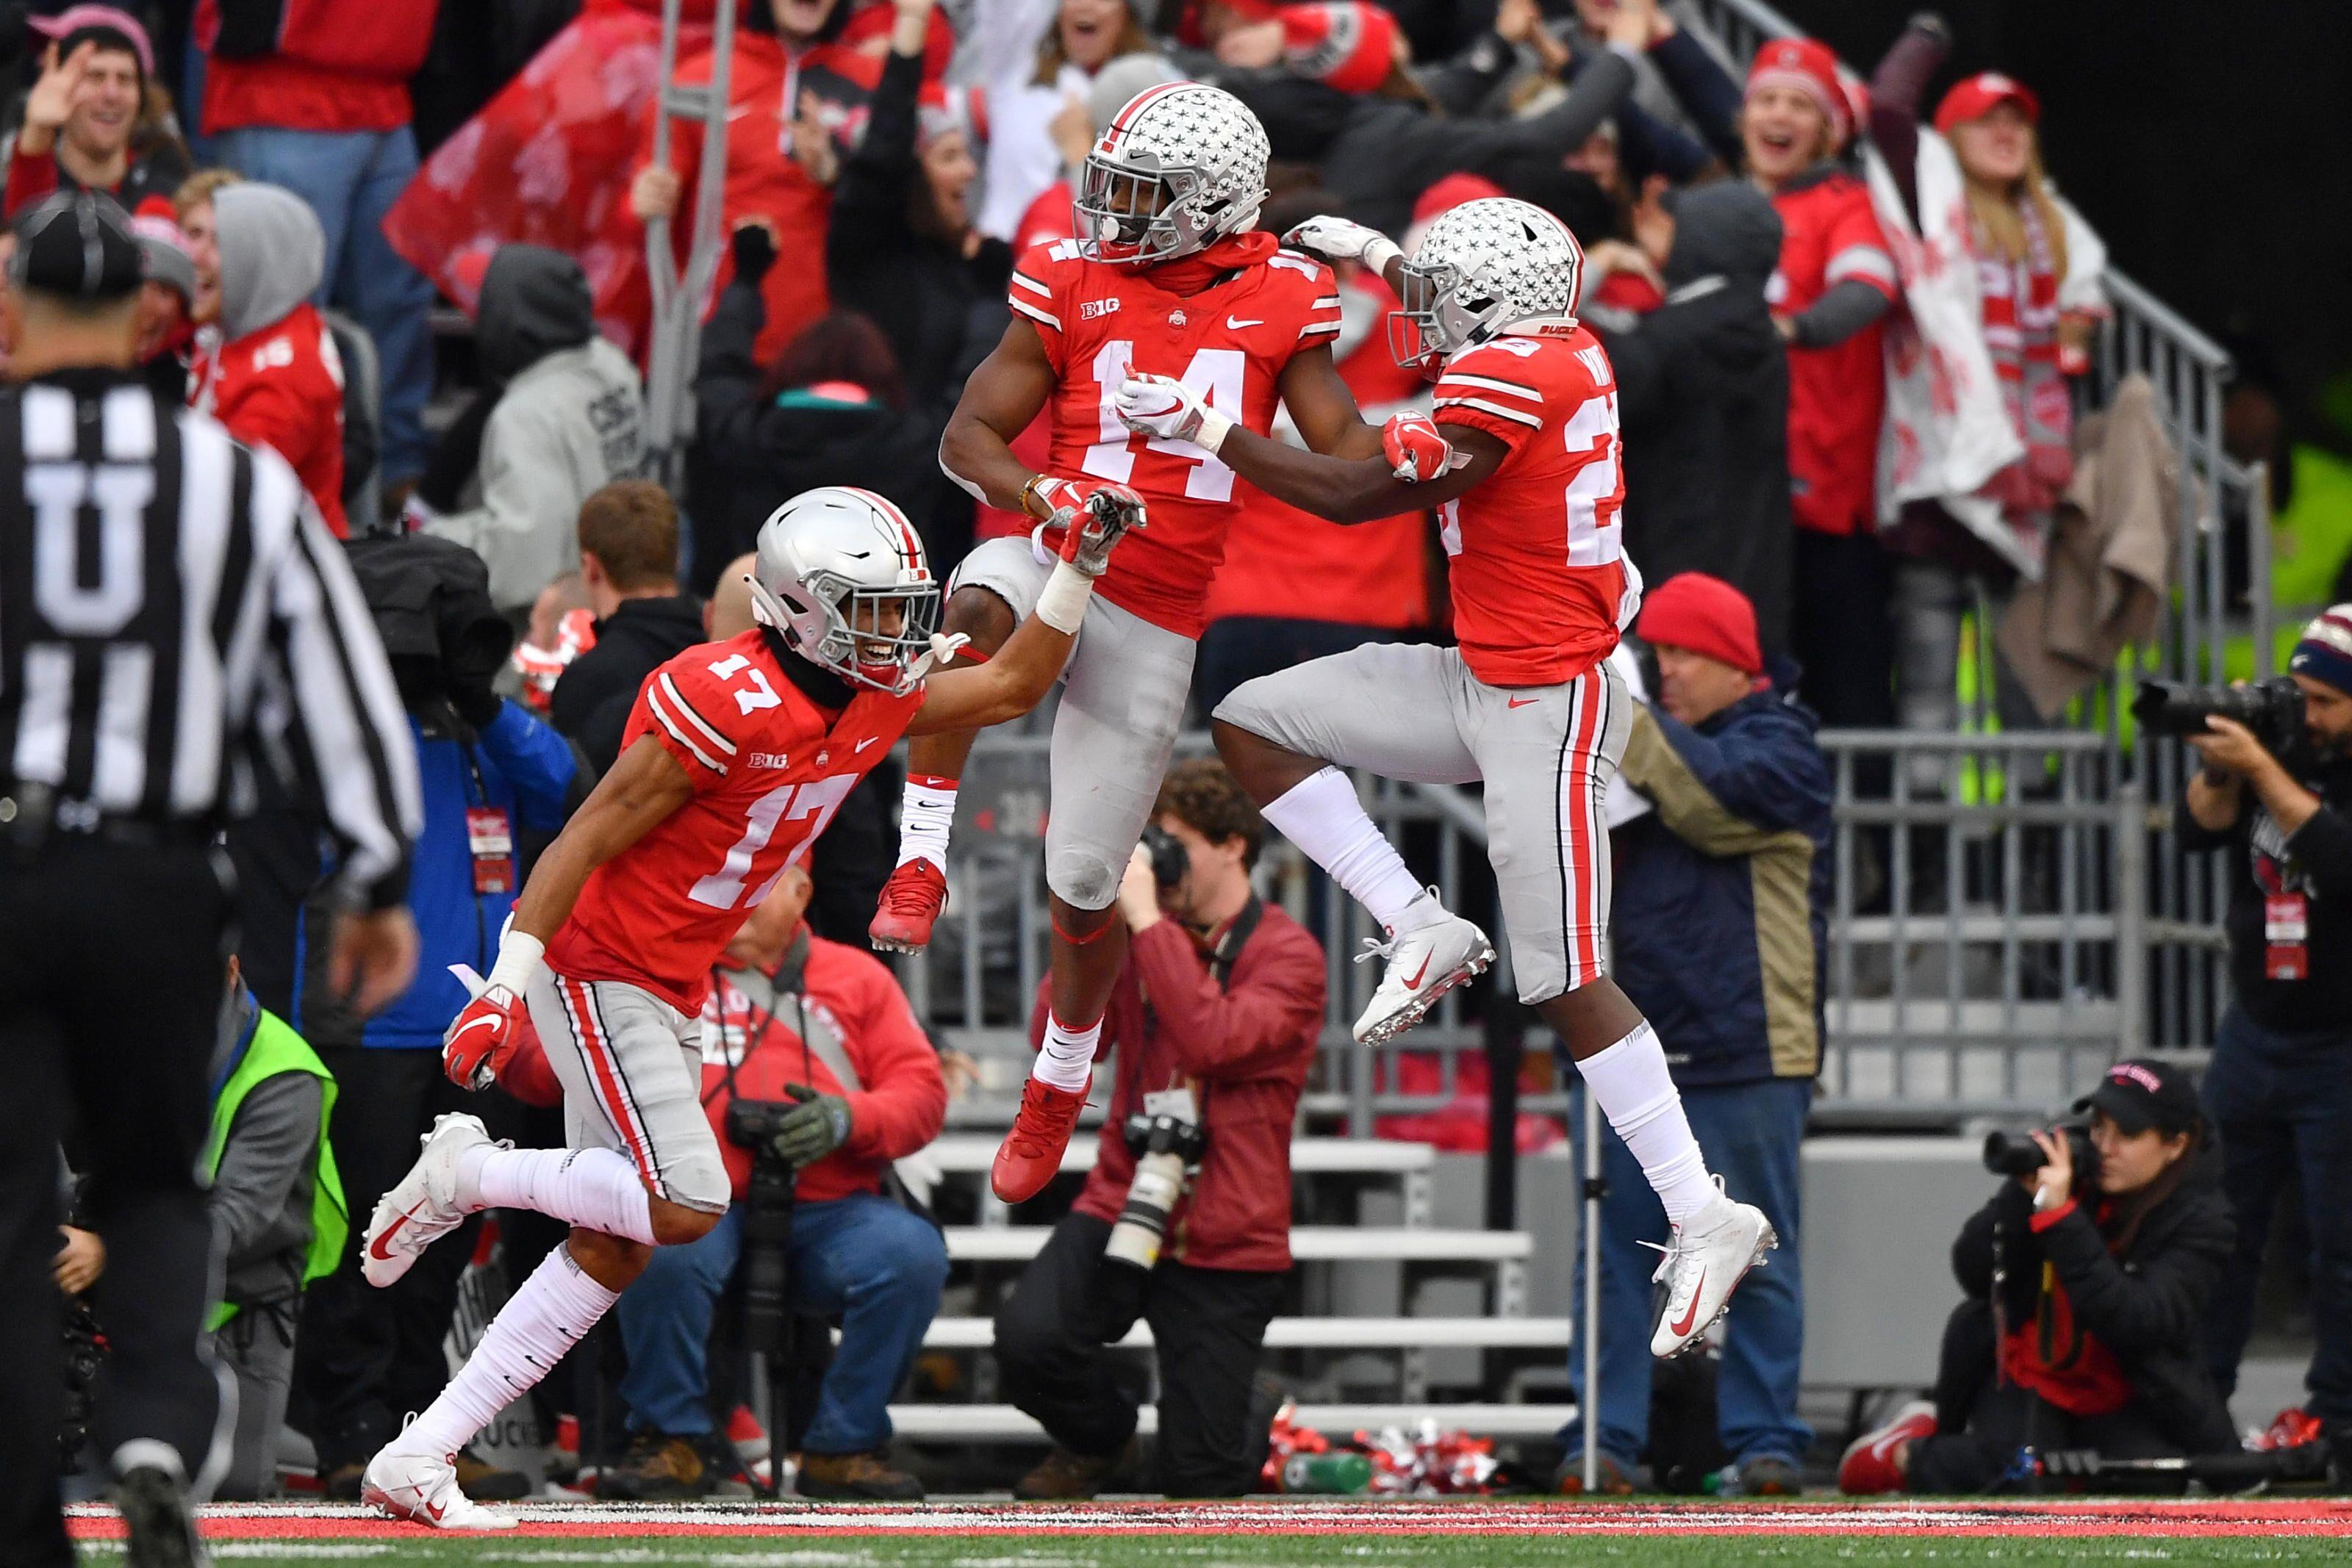 Ohio State Football: Brian Hartline will produce elite WRs again in 2019